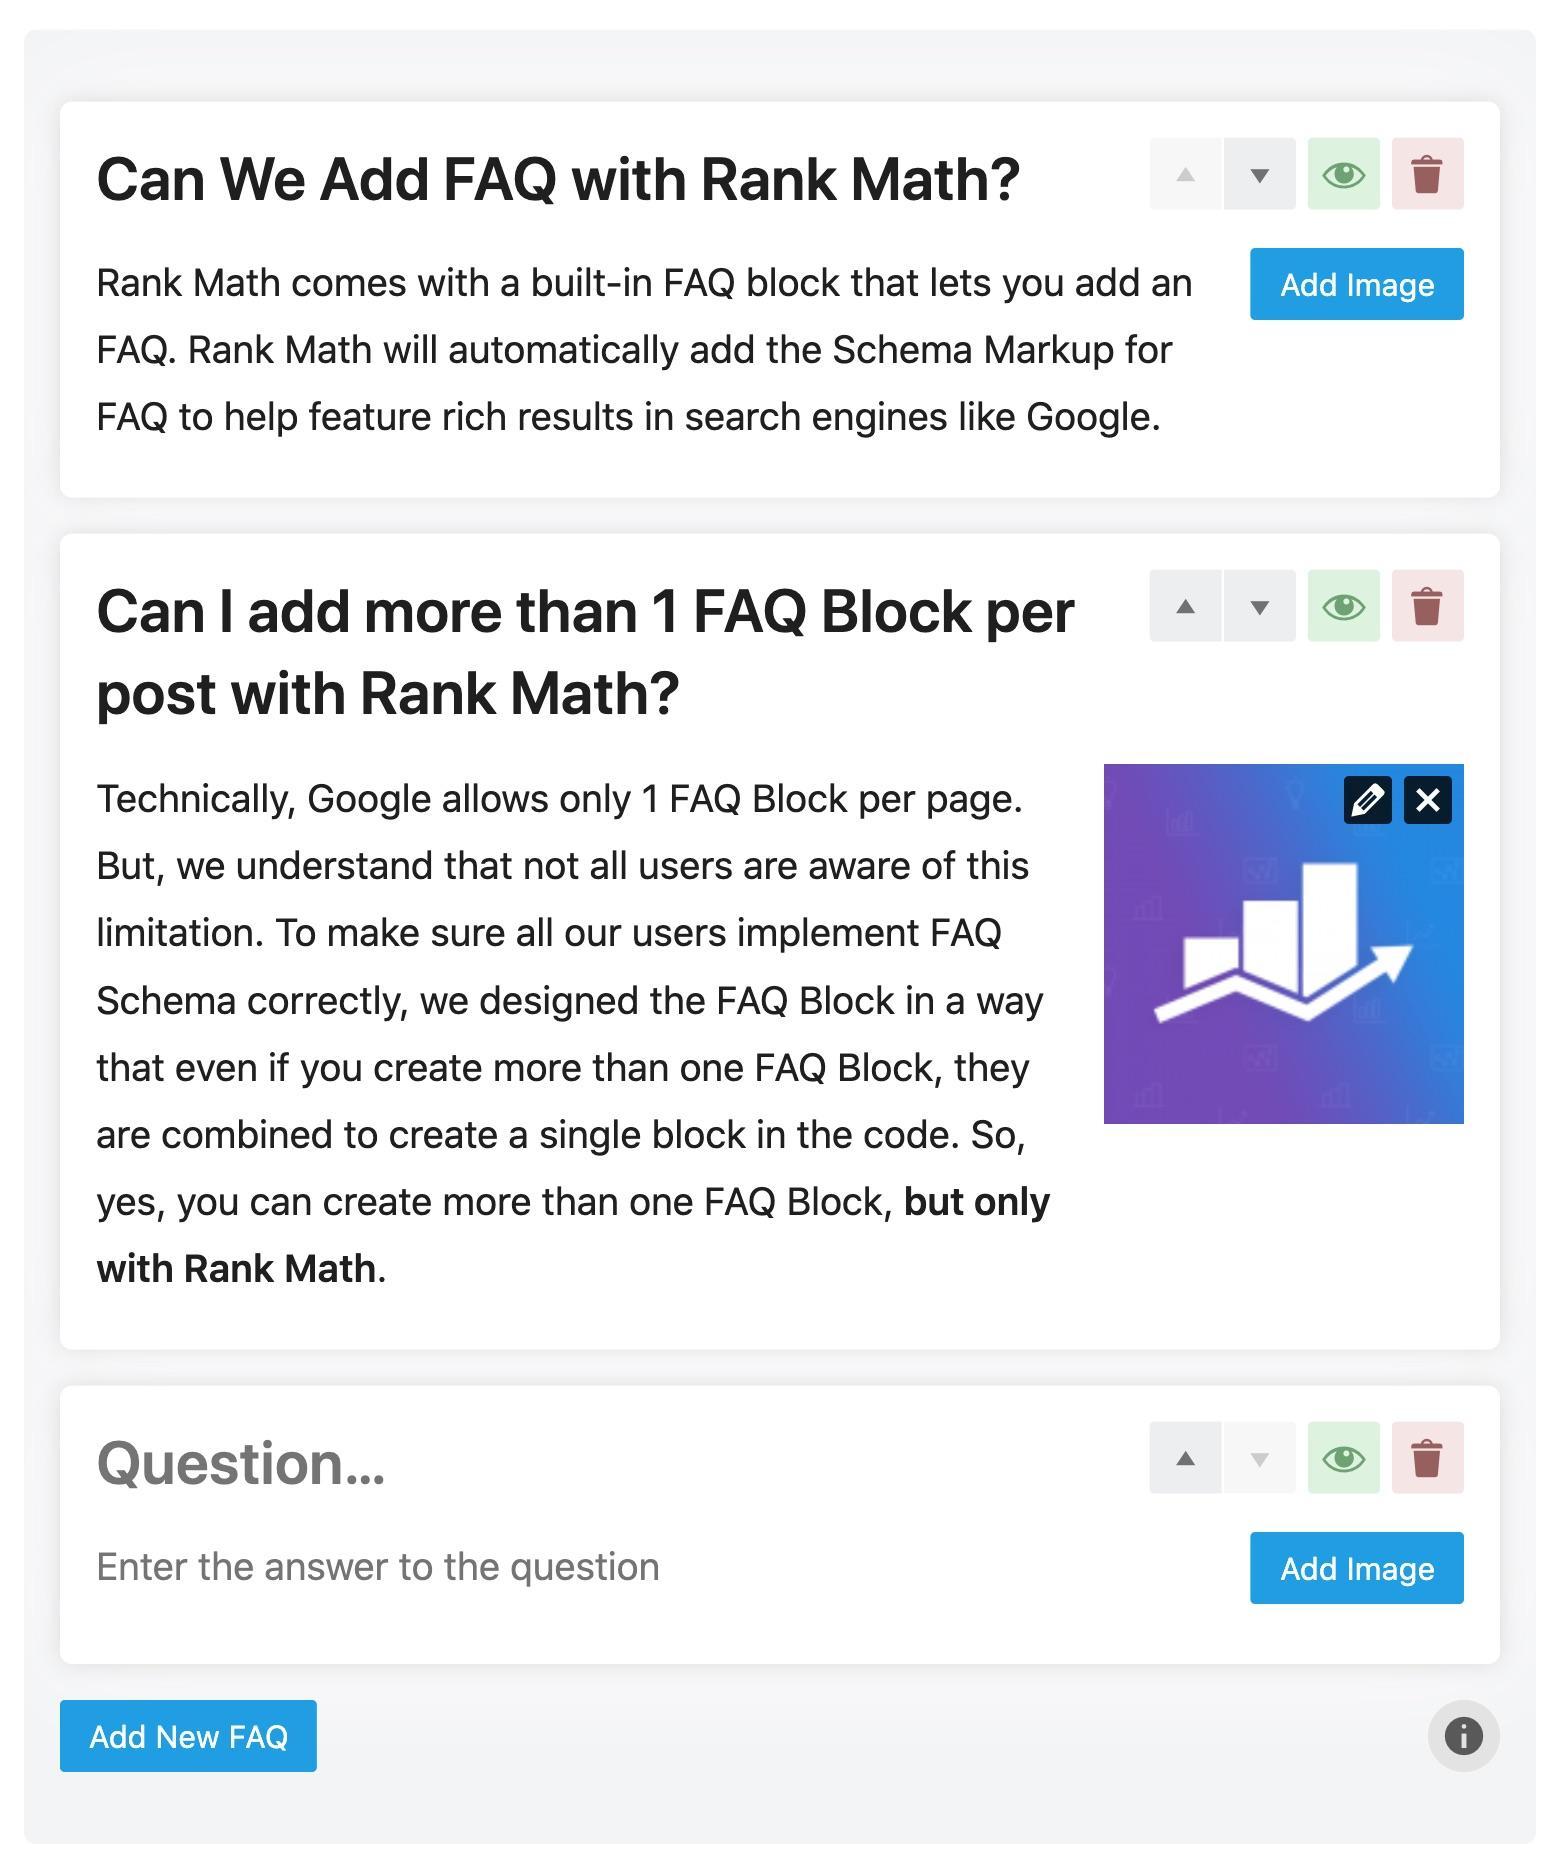 Rank Math FAQ block editor